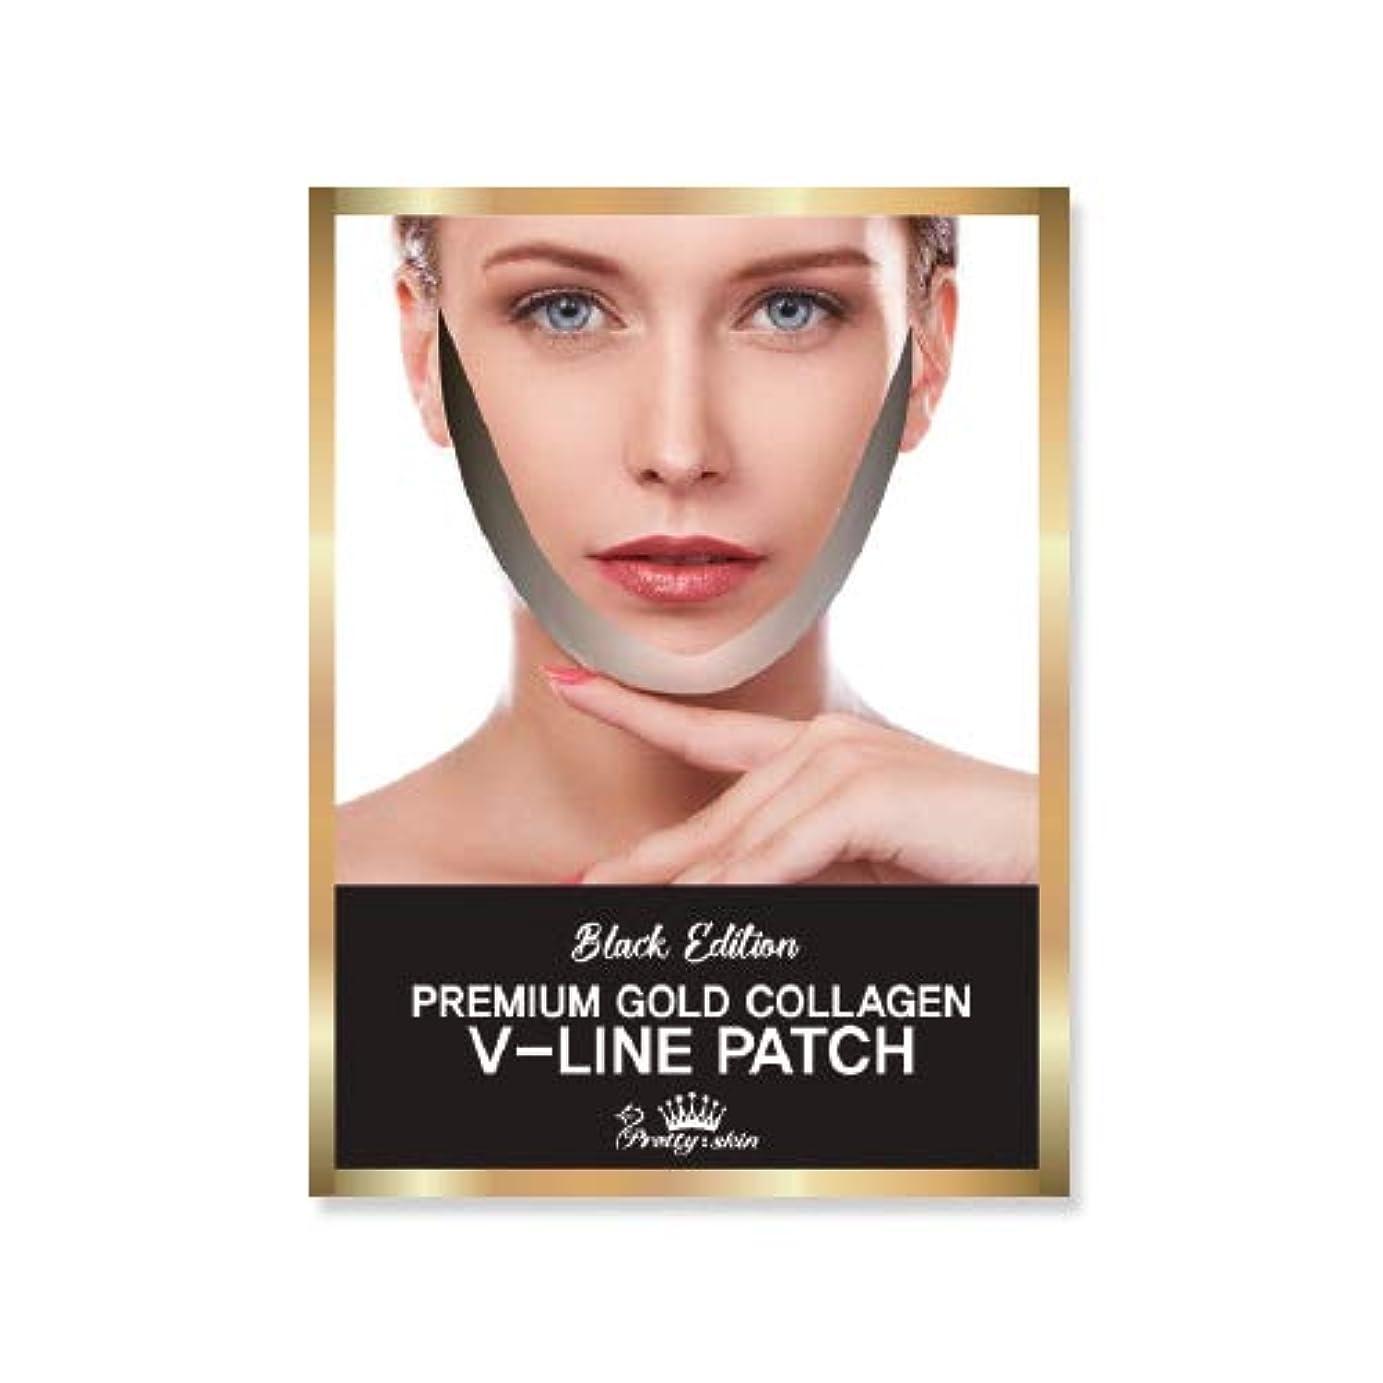 pretty skin プリティスキン V-LINE PATCH ブイラインパッチ リフトアップ マスク (5枚組, ブラック)